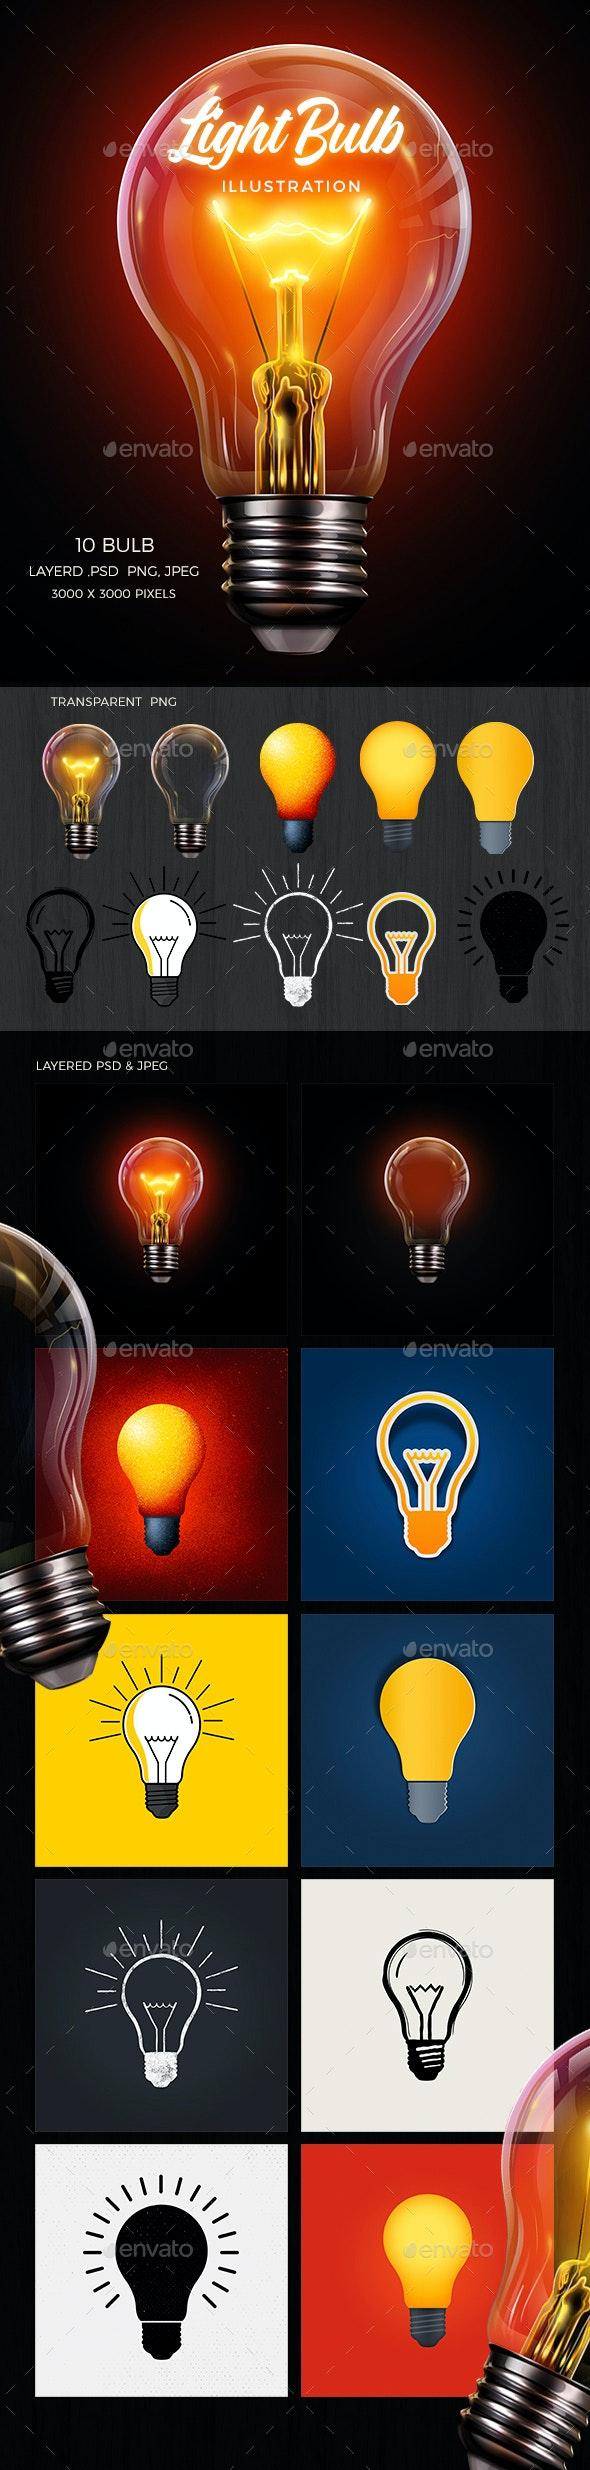 Light Bulb Illustration Set - Objects Illustrations